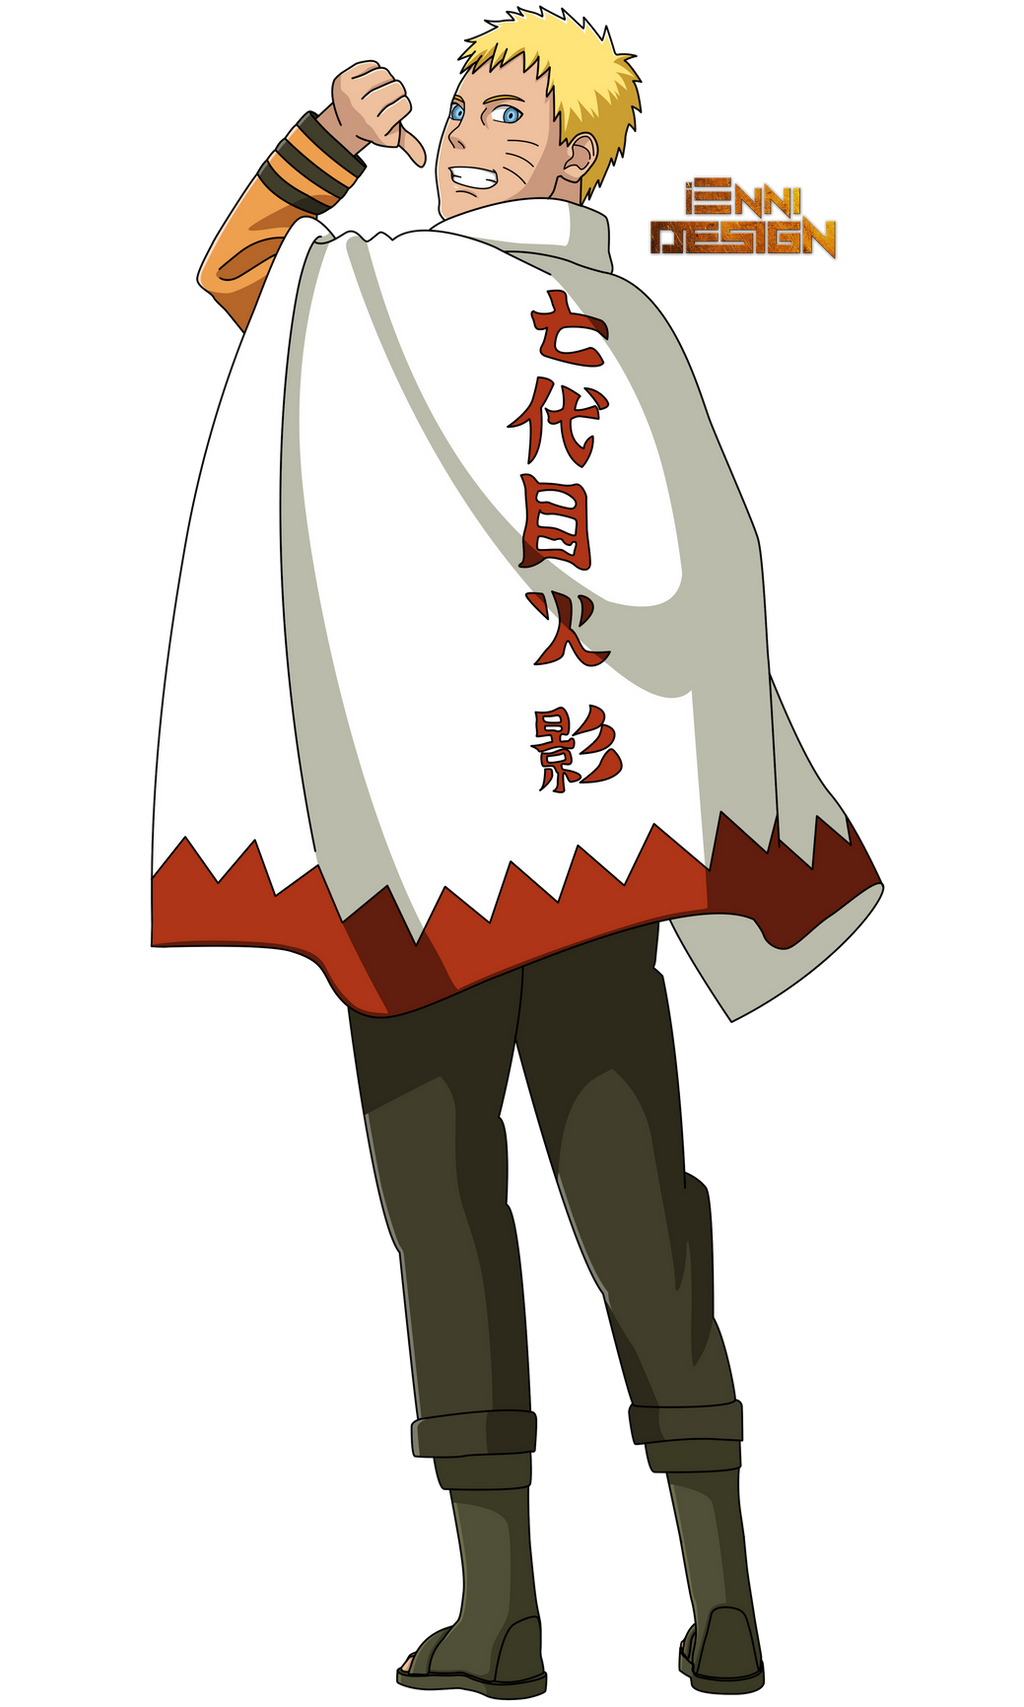 Aljk nZT0uad6x3RVM7P3DpXNN6Nm2ZzND additionally Boruto 607777276 further Himawari Uzumaki And Sarada Uchiha 684664747 in addition Naruto Bijuu Mode 454813962 additionally Naruto Gif. on boruto uzumaki chakra mode